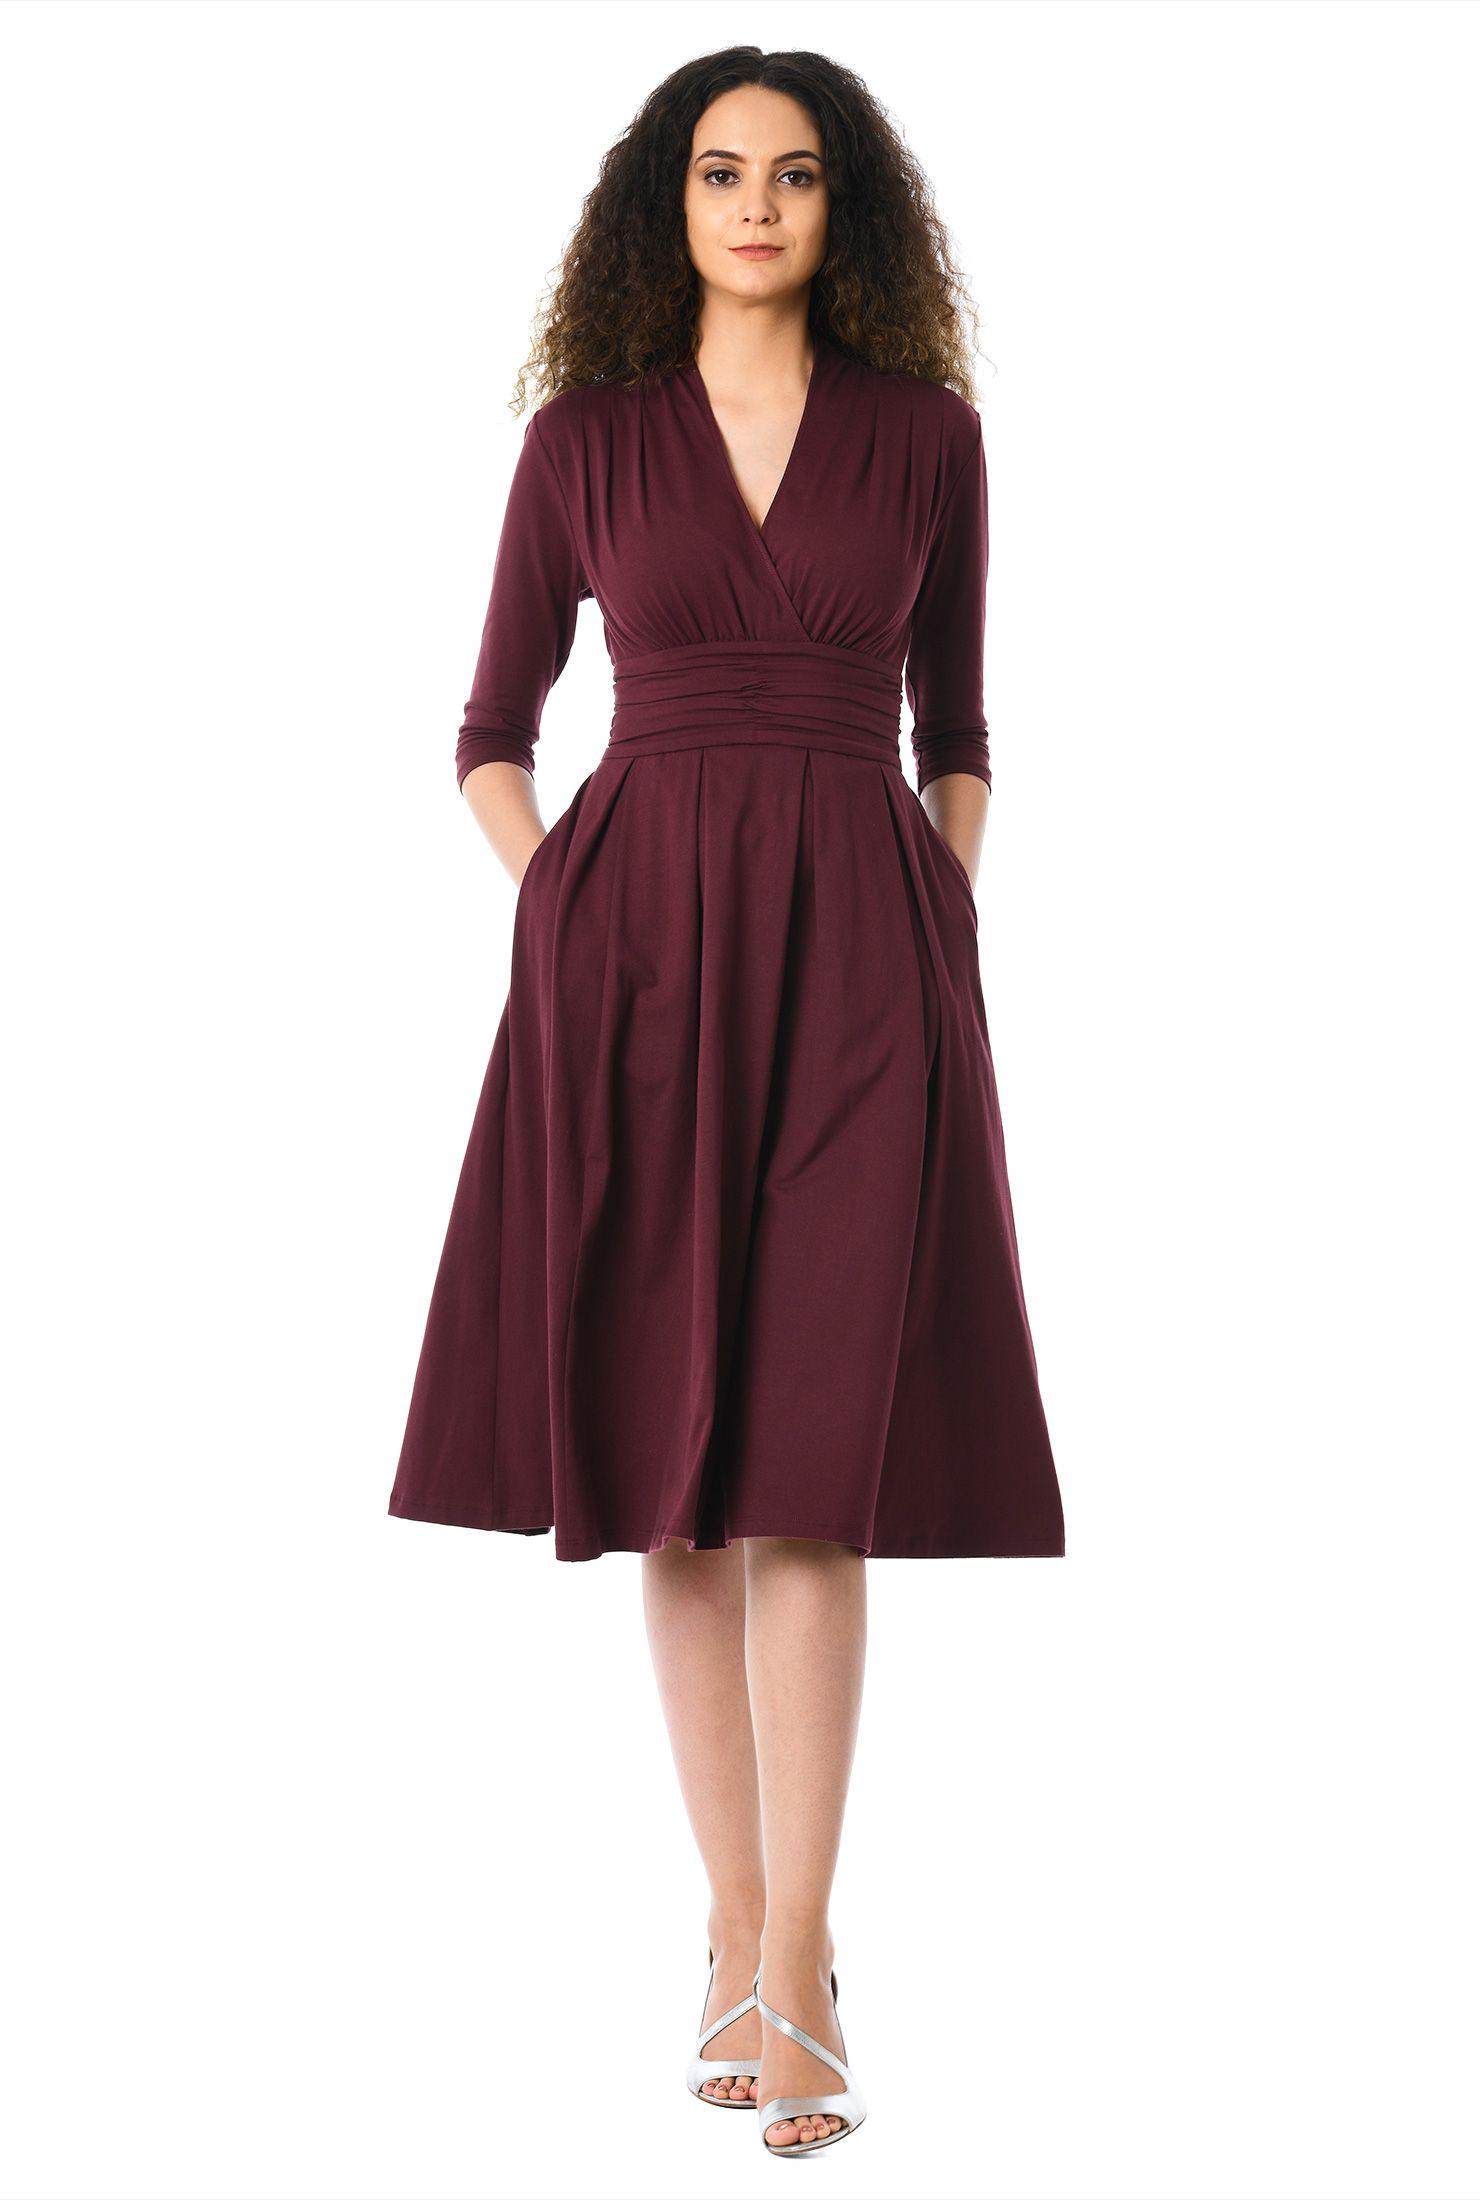 Popular Dress Styles